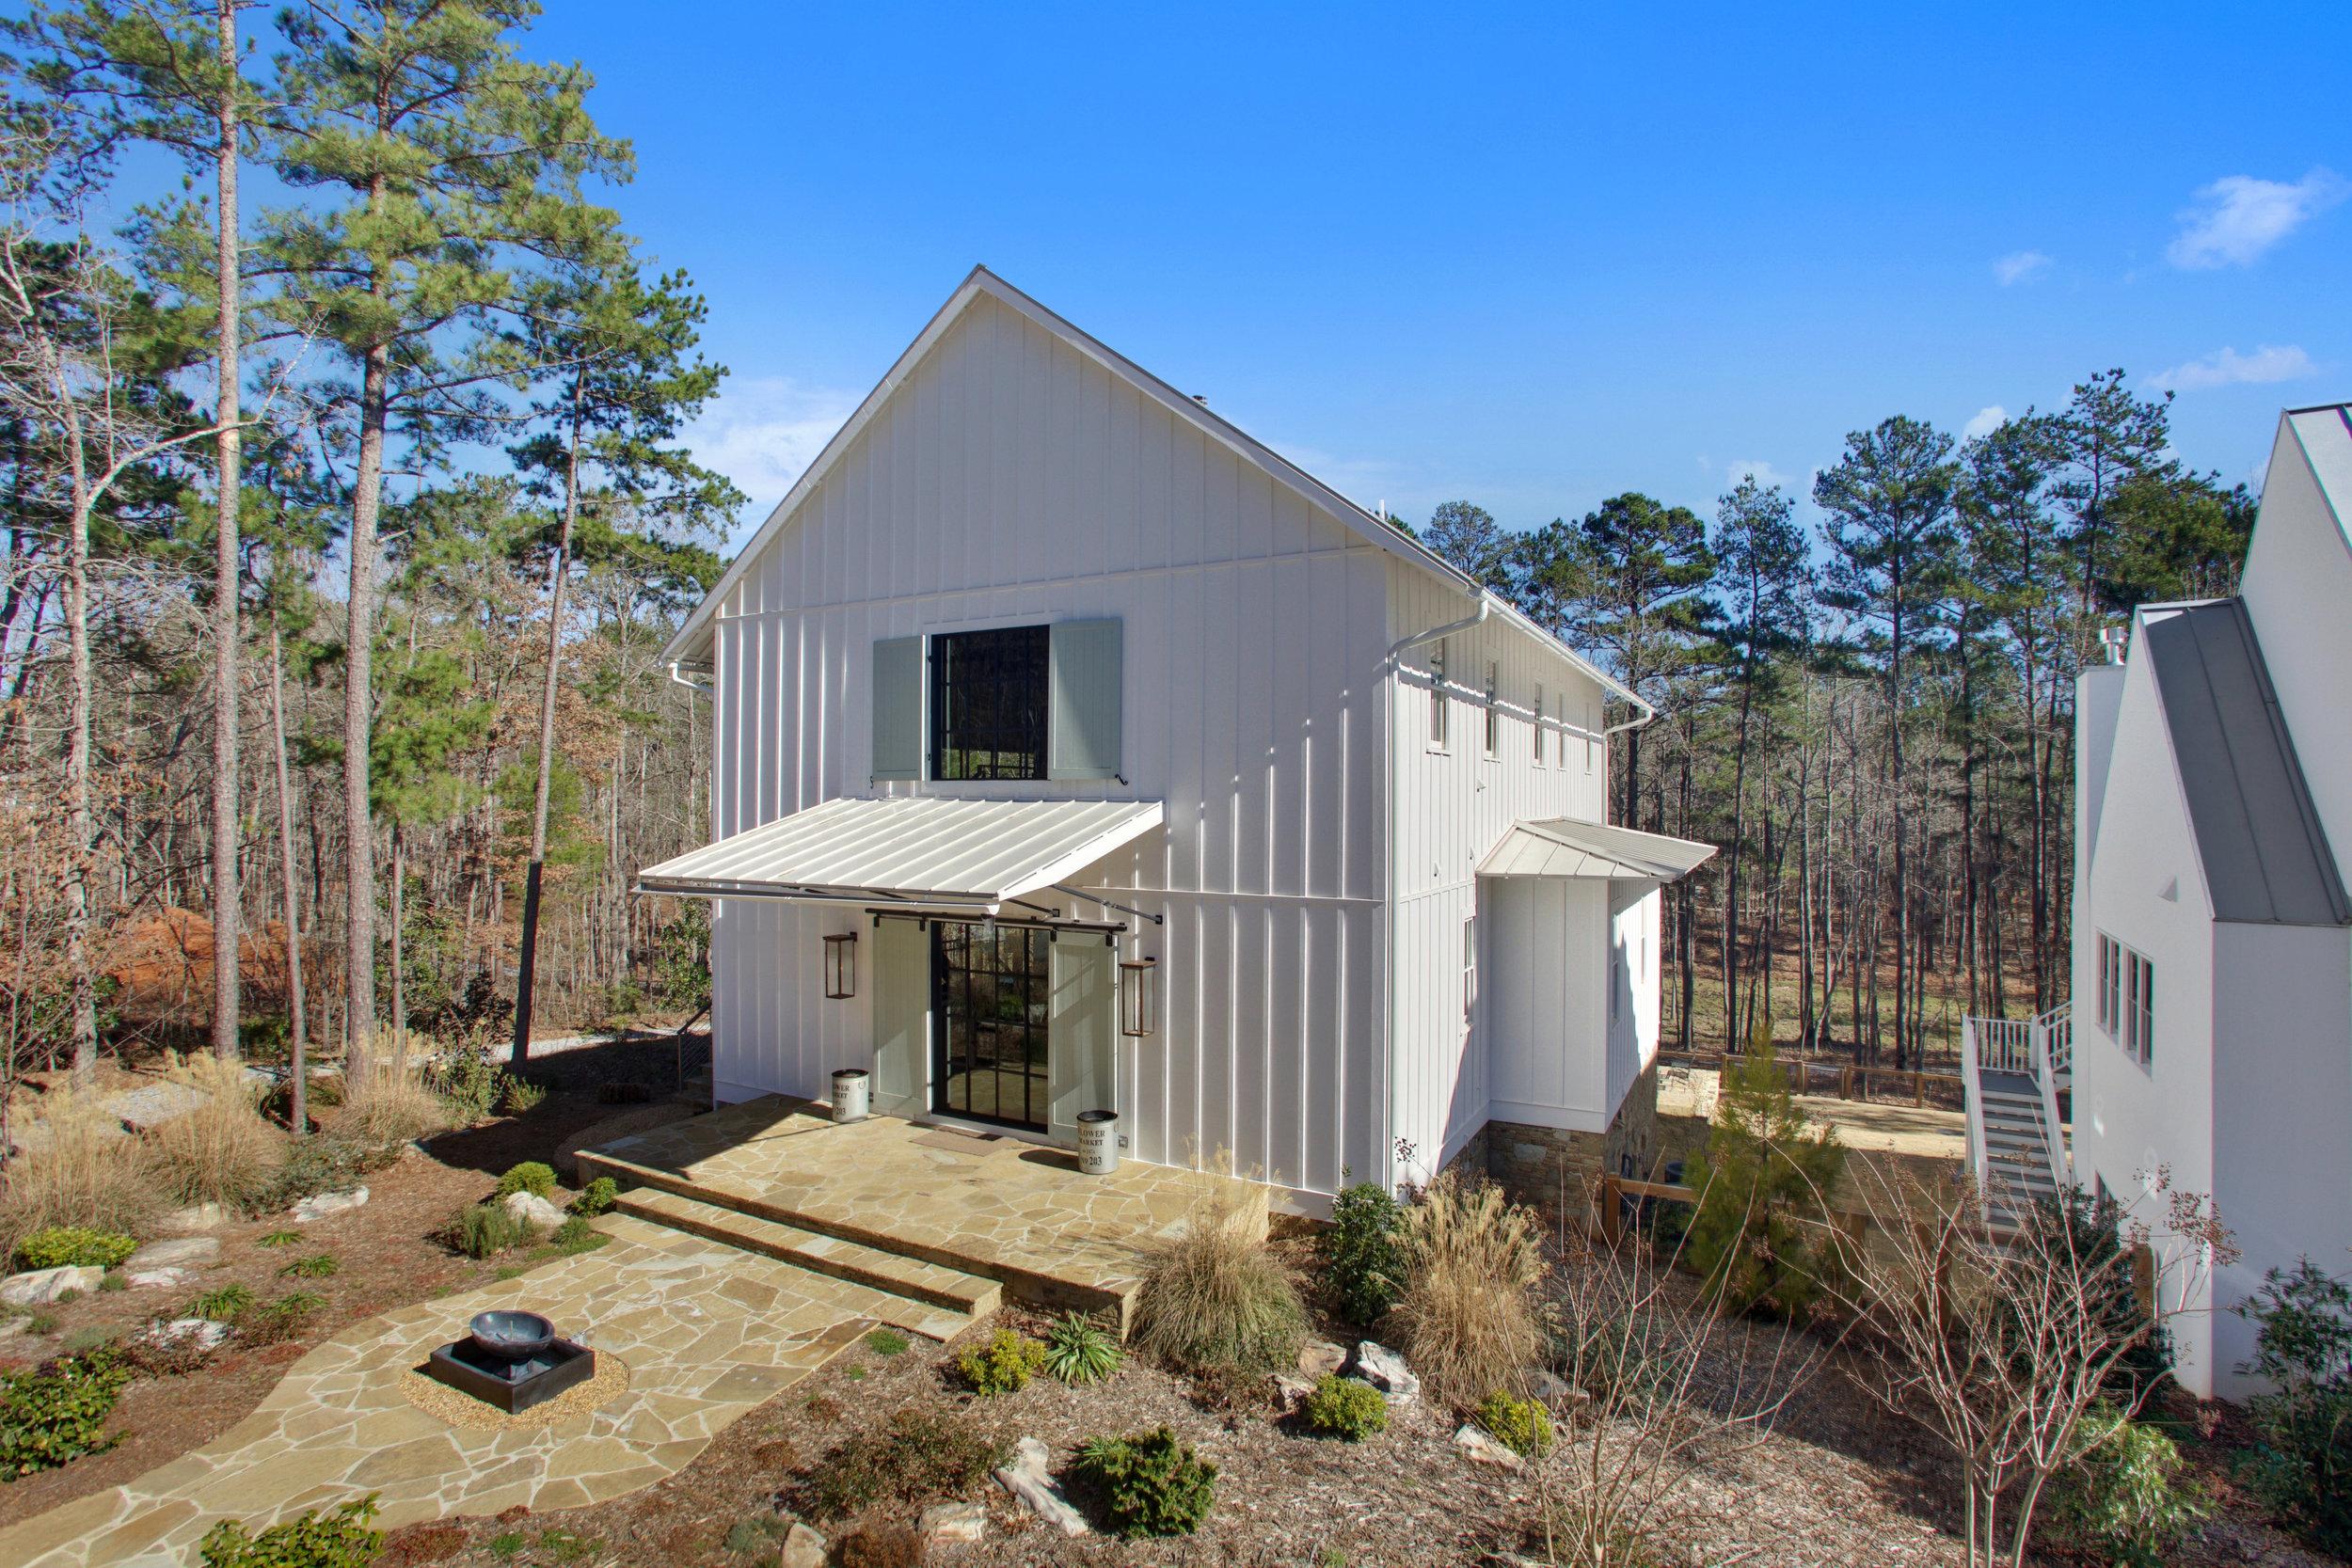 Modern Farmhouse     3 Beds 3.5 Baths 4,000 SQFT    Serenbe Community    Chattahoochee Hills, GA